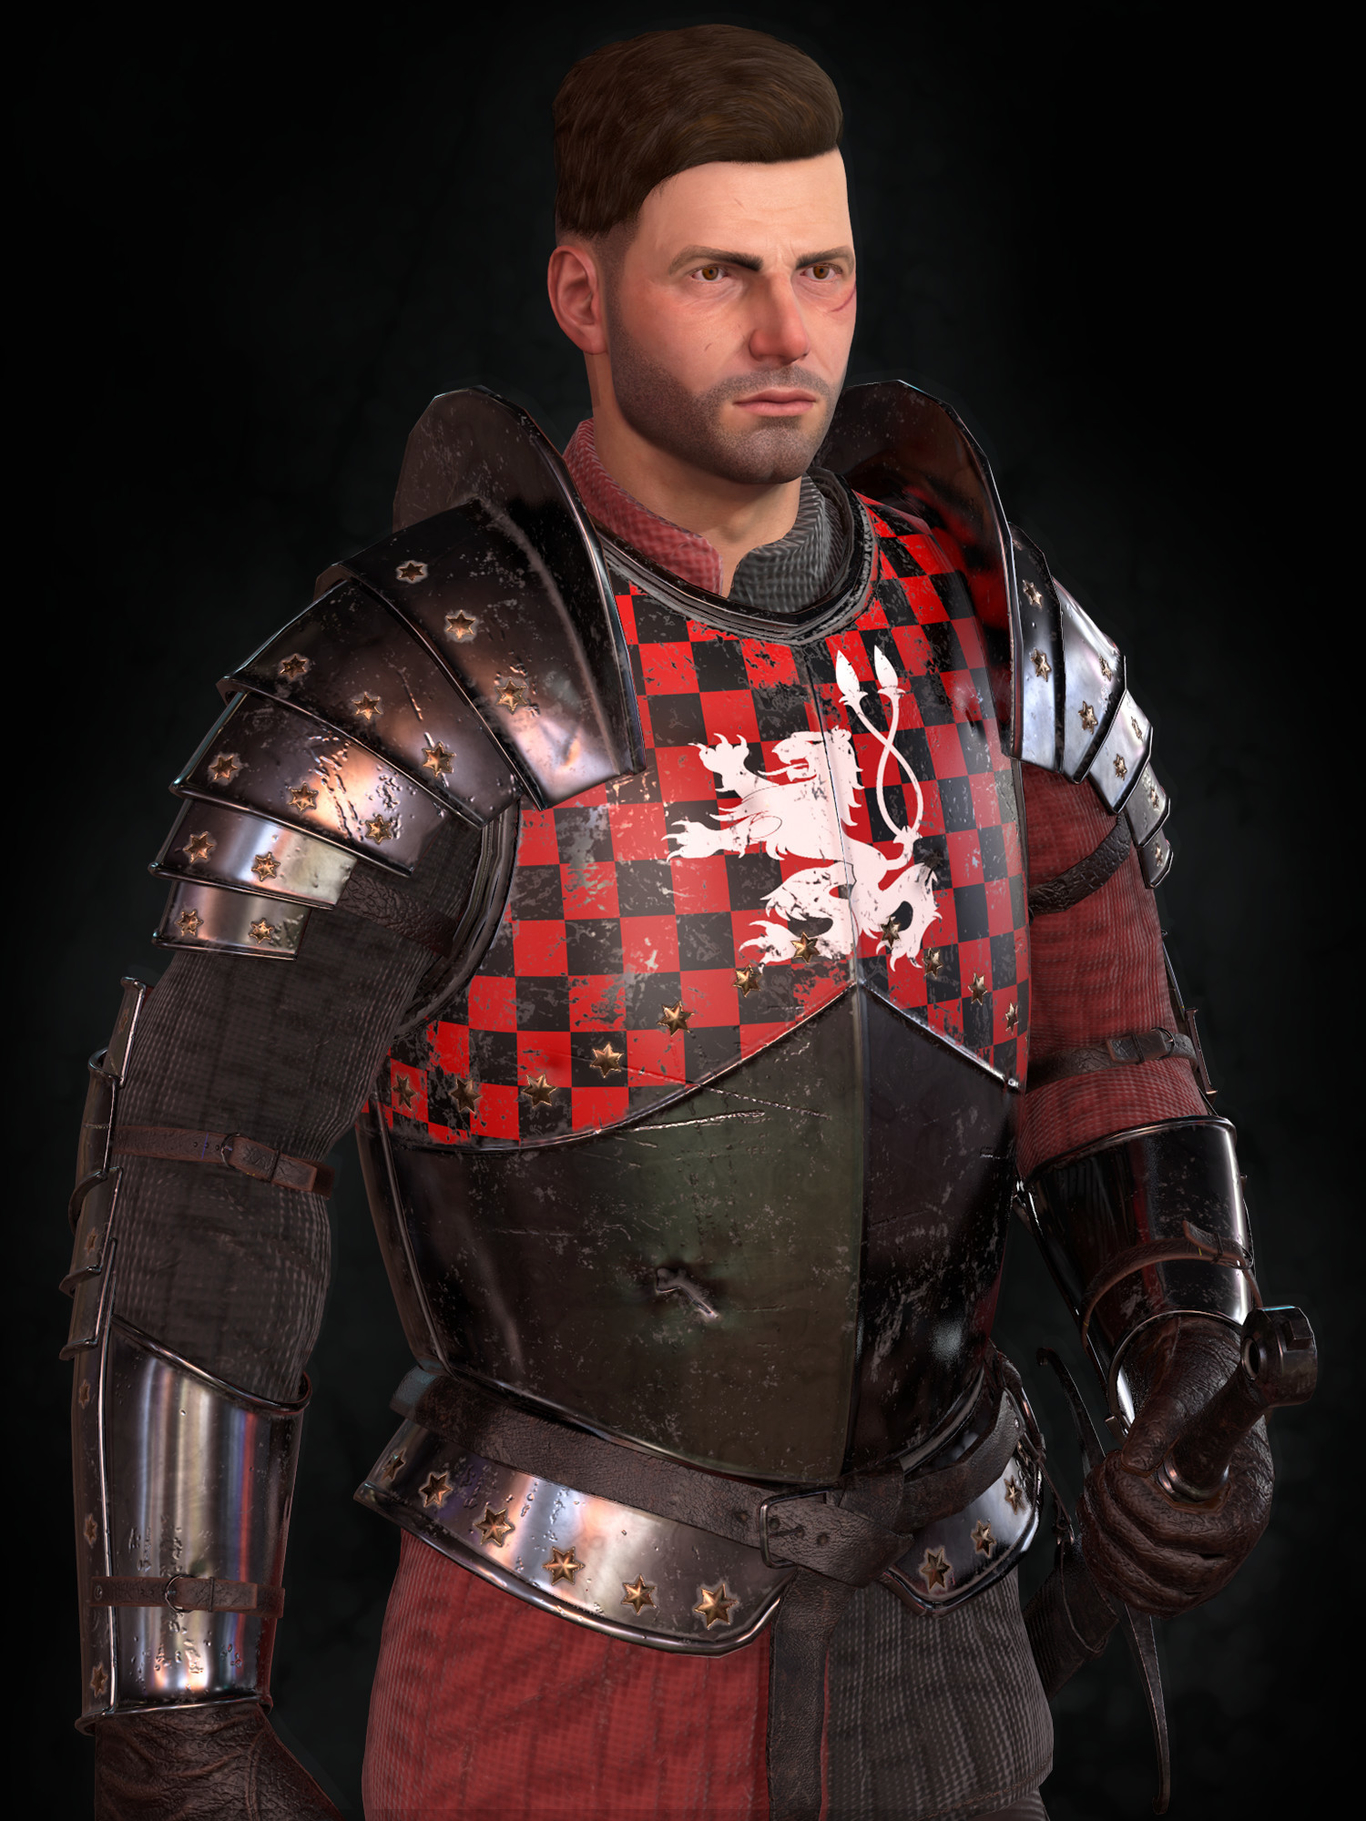 Korym knight character 1 46ae6f1a luvj